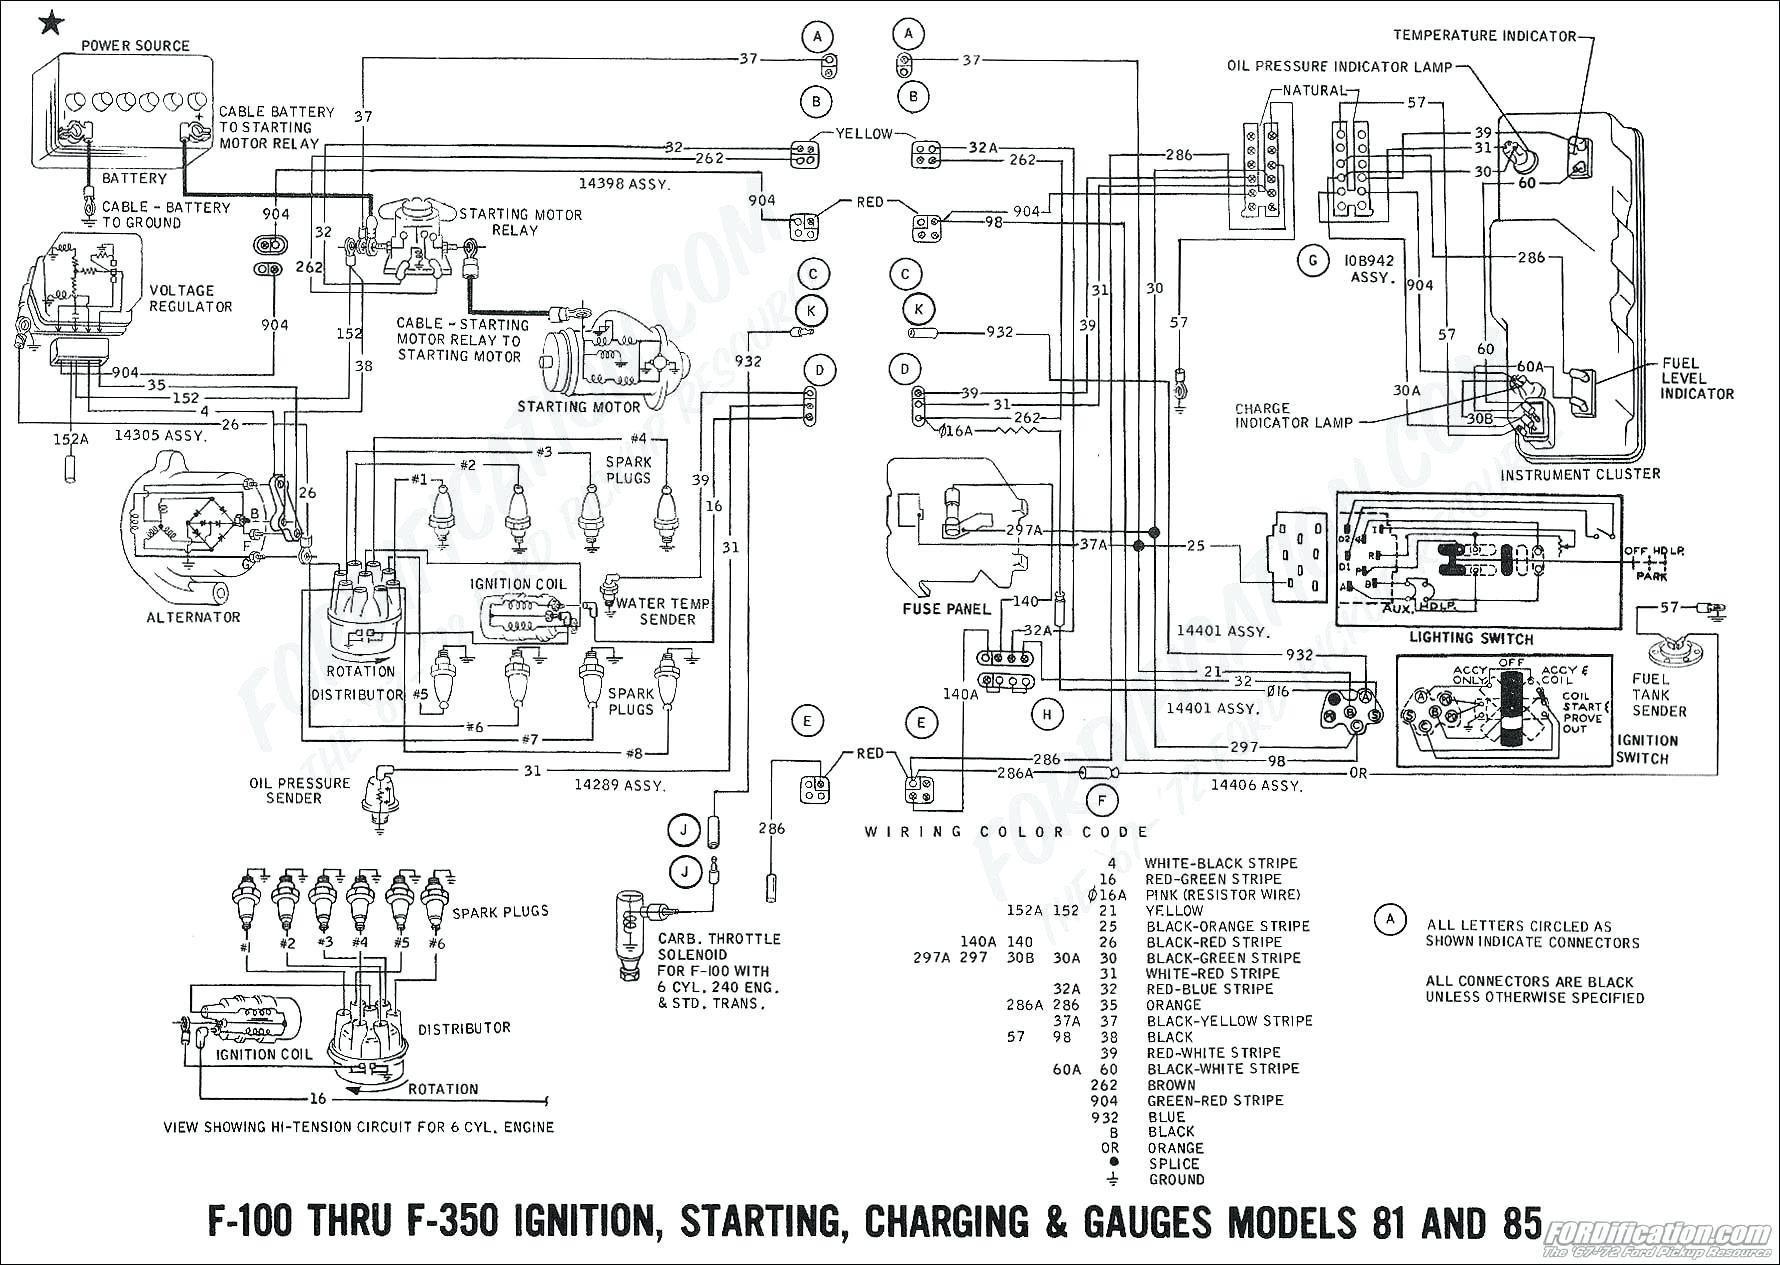 Ford F250 Wiring Diagram For Trailer Light Bookingritzcarlton Info Ford Truck Diagram Design Diagram